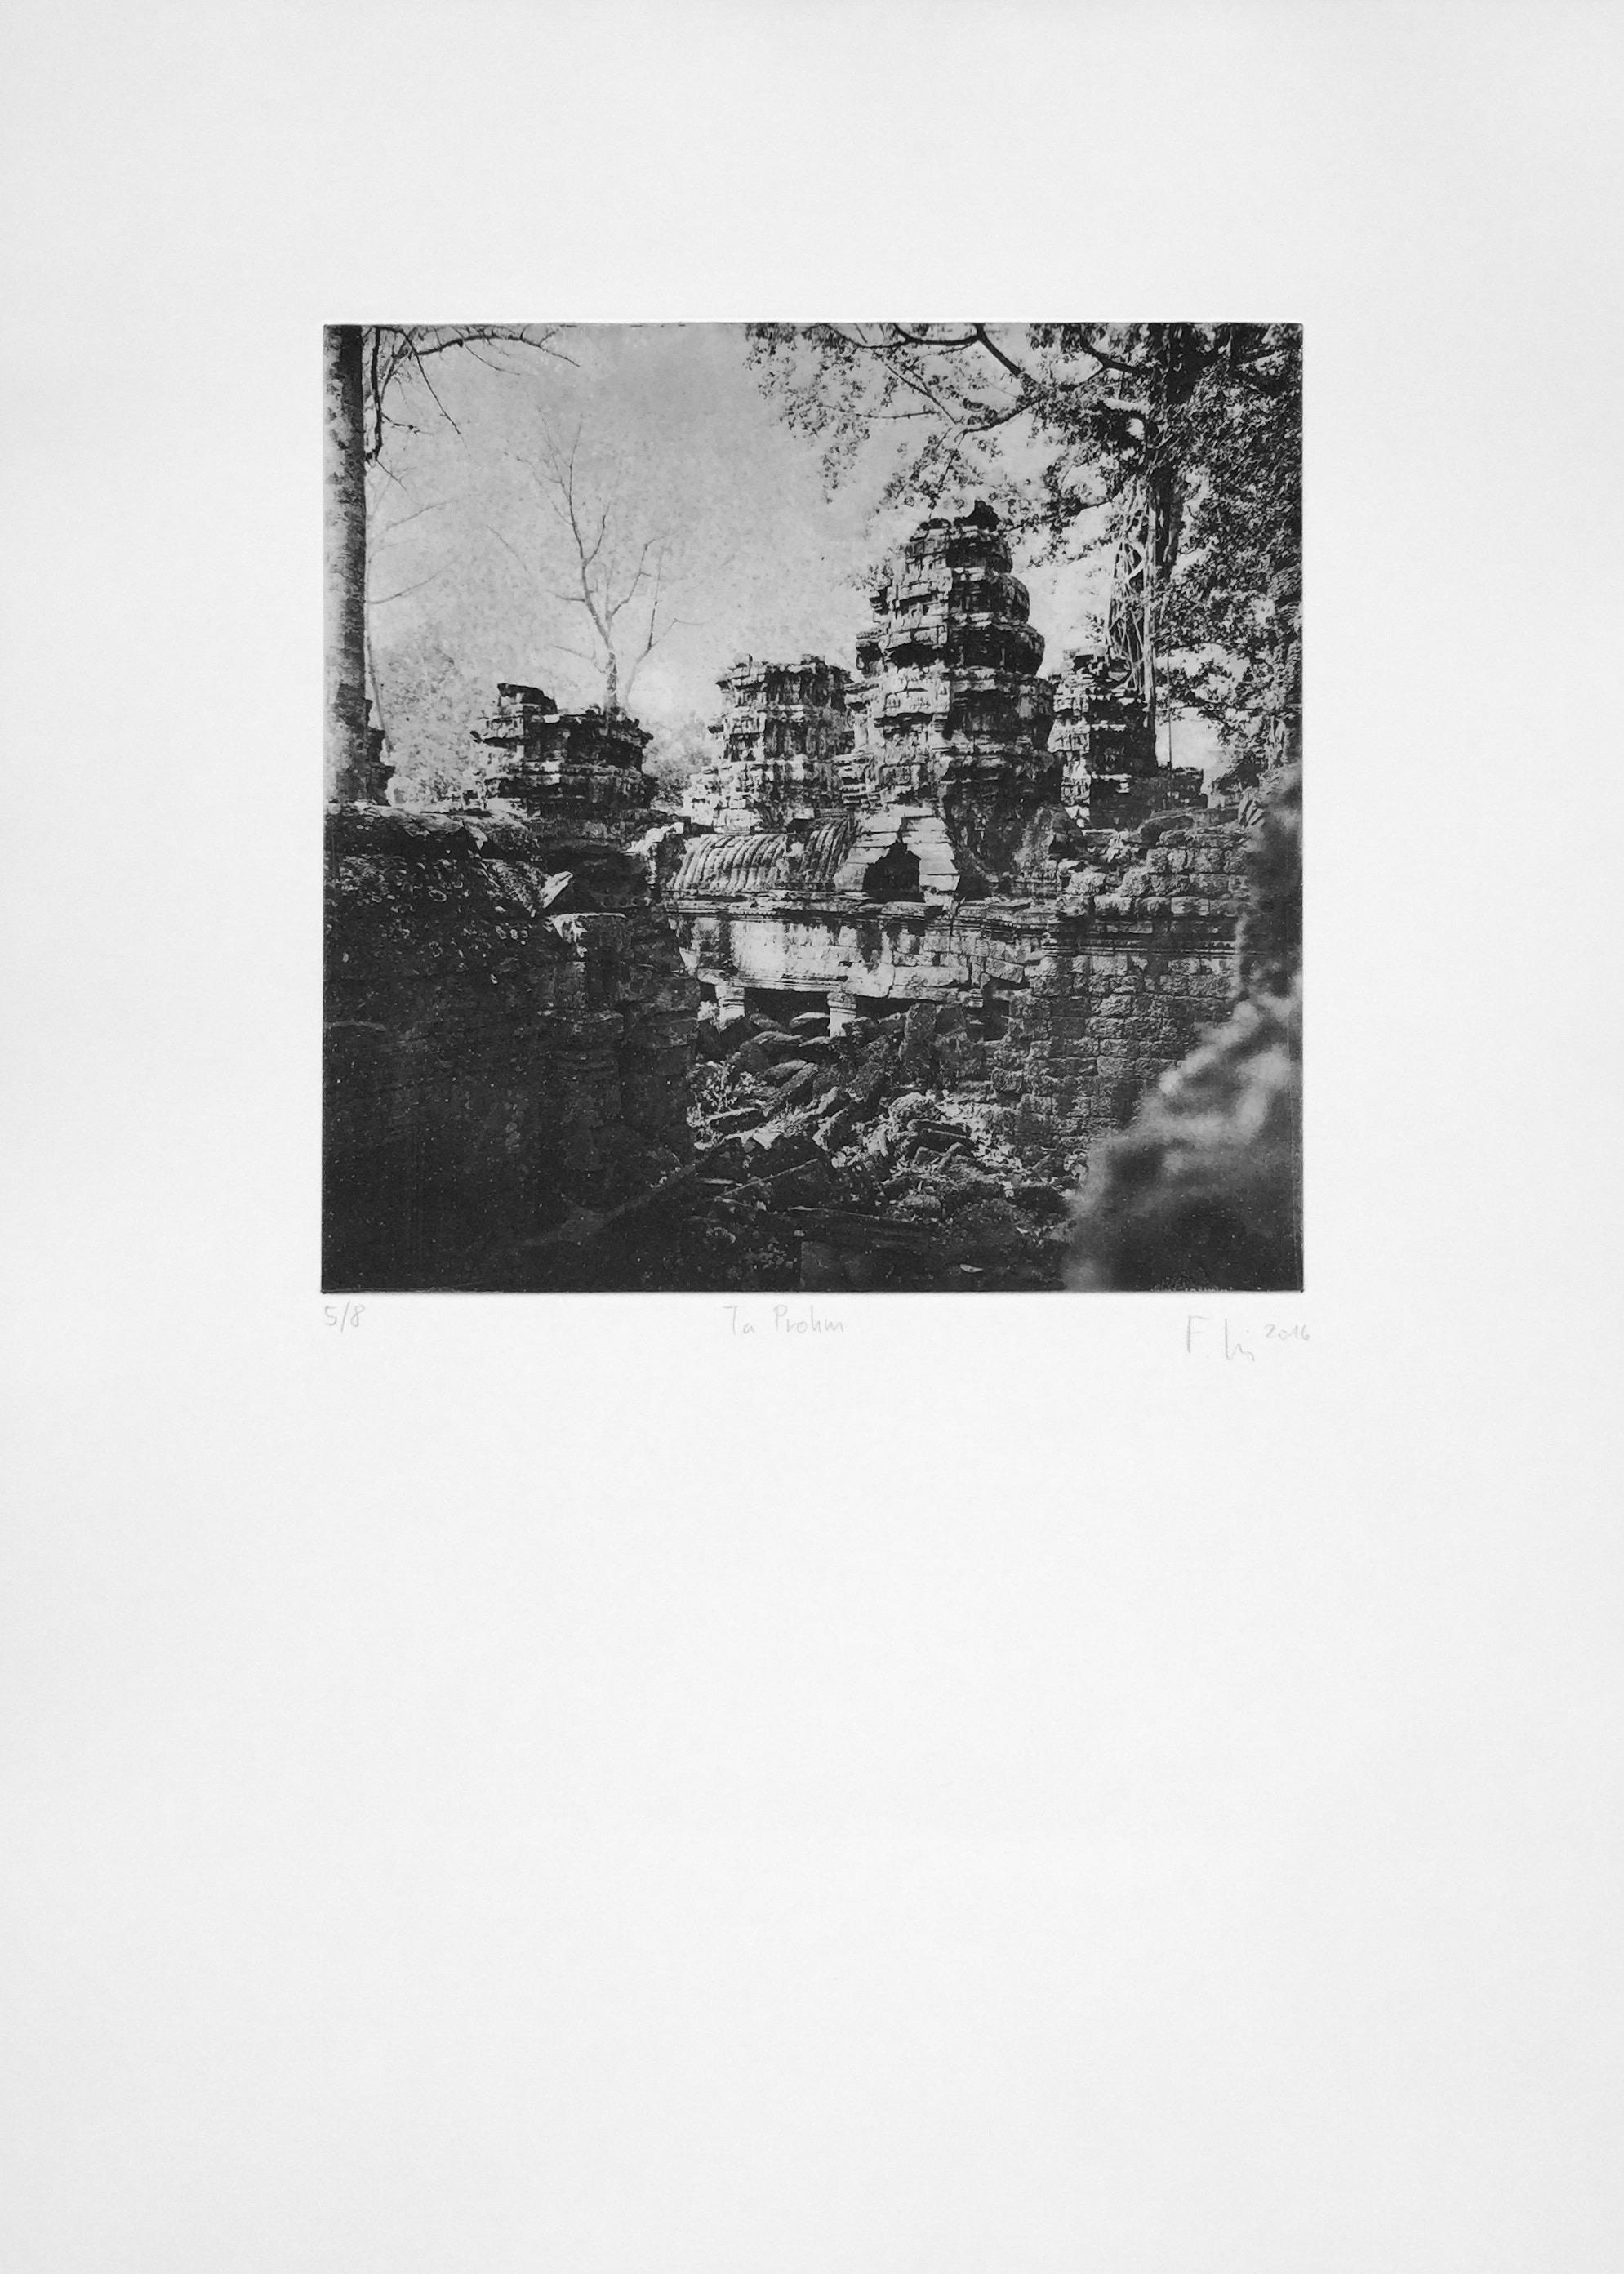 Ta Prohm (2016)  medium: Heliogravüre  size: 50 x 70 cm  paper: Zerkall 250 g/qm  plate: 30 x 30 cm  edition:12 copies  numbered: 1/8 - 8/8, 4 e.a.  printer: FWU